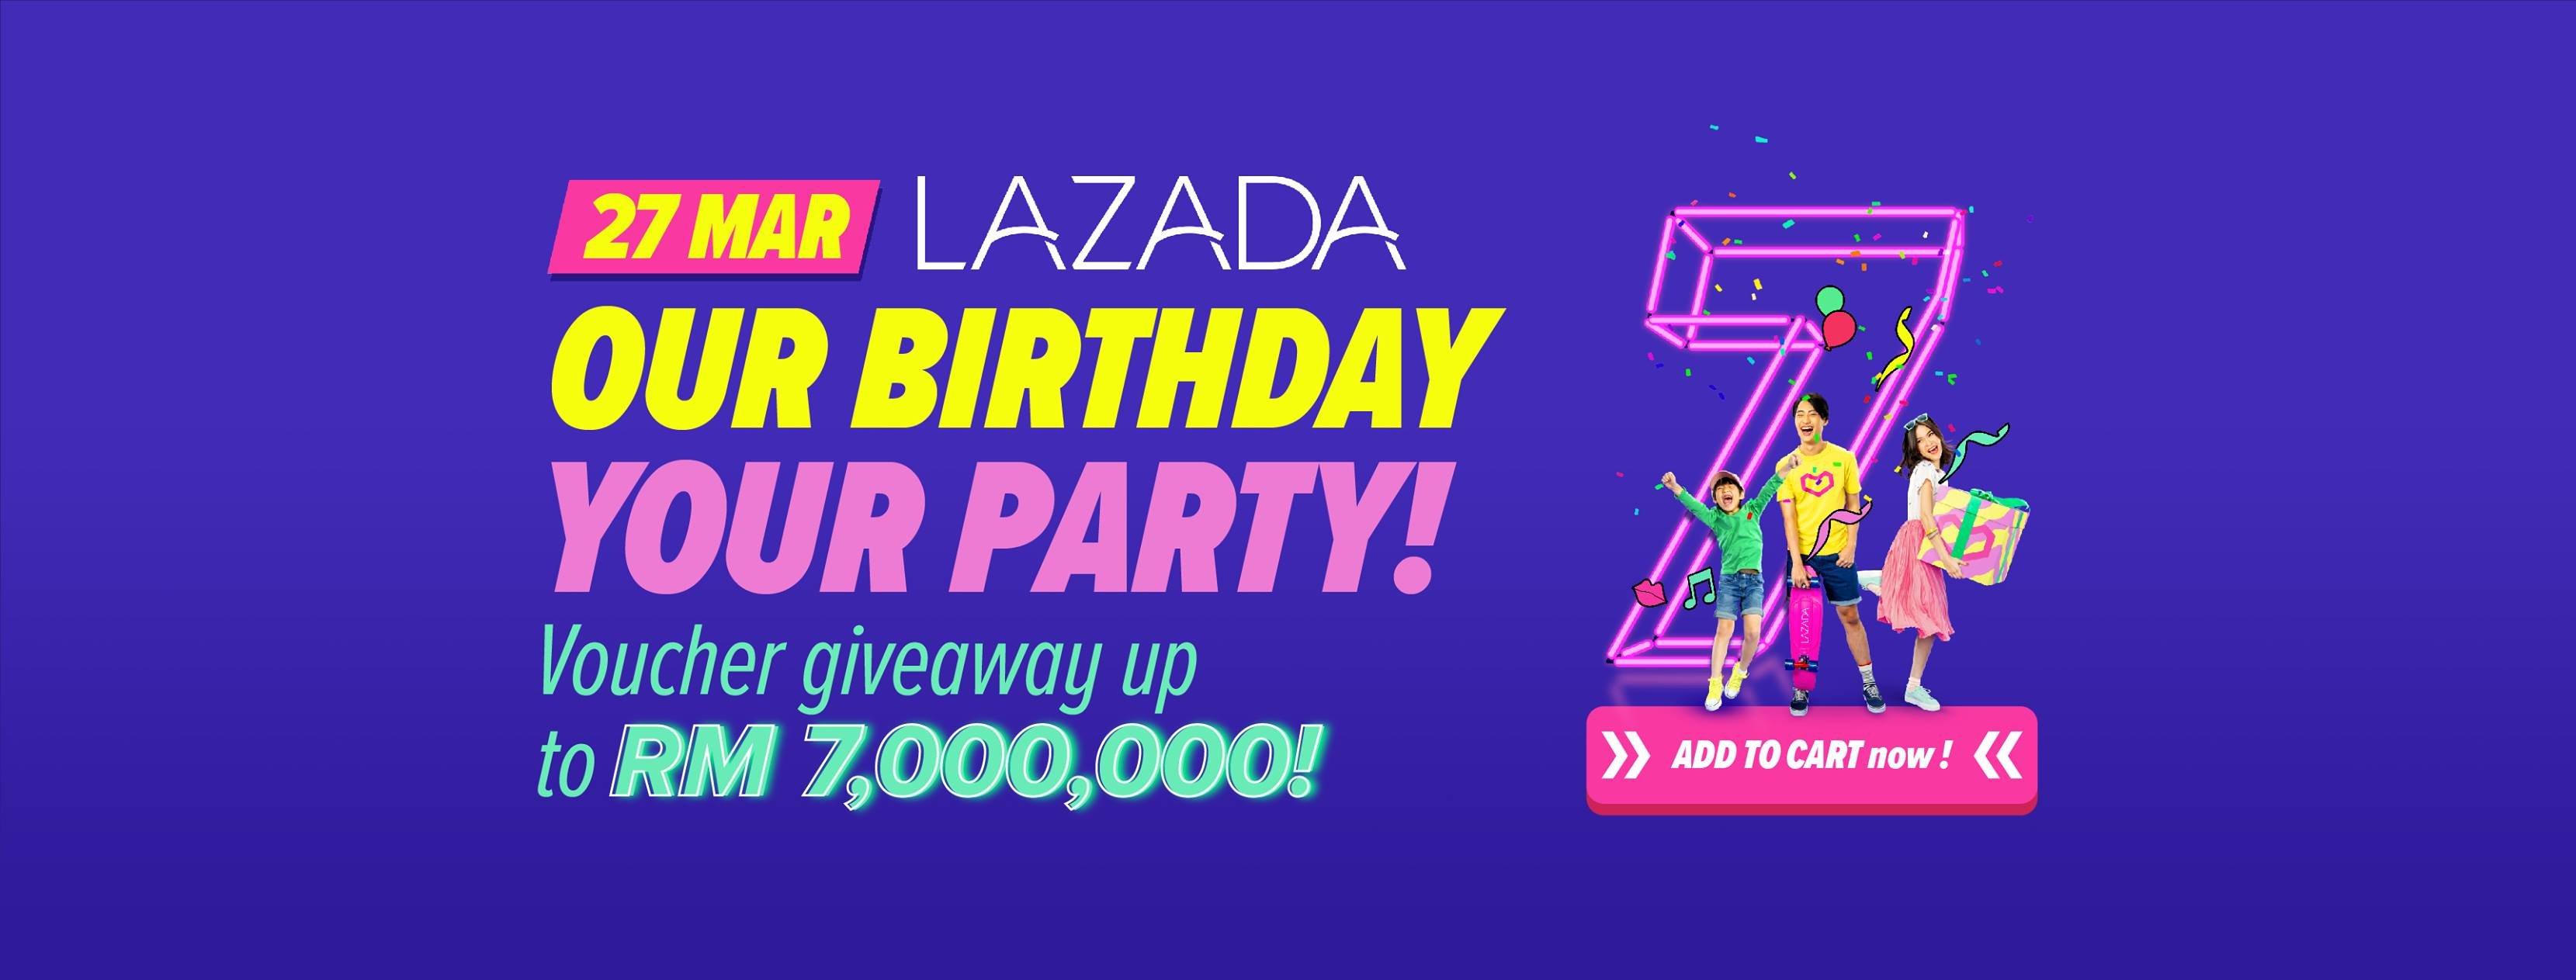 Lazada Anniversary Sale 2019 - Coupon Malaysia, Malaysia Sales Calendar 2019 Lazada